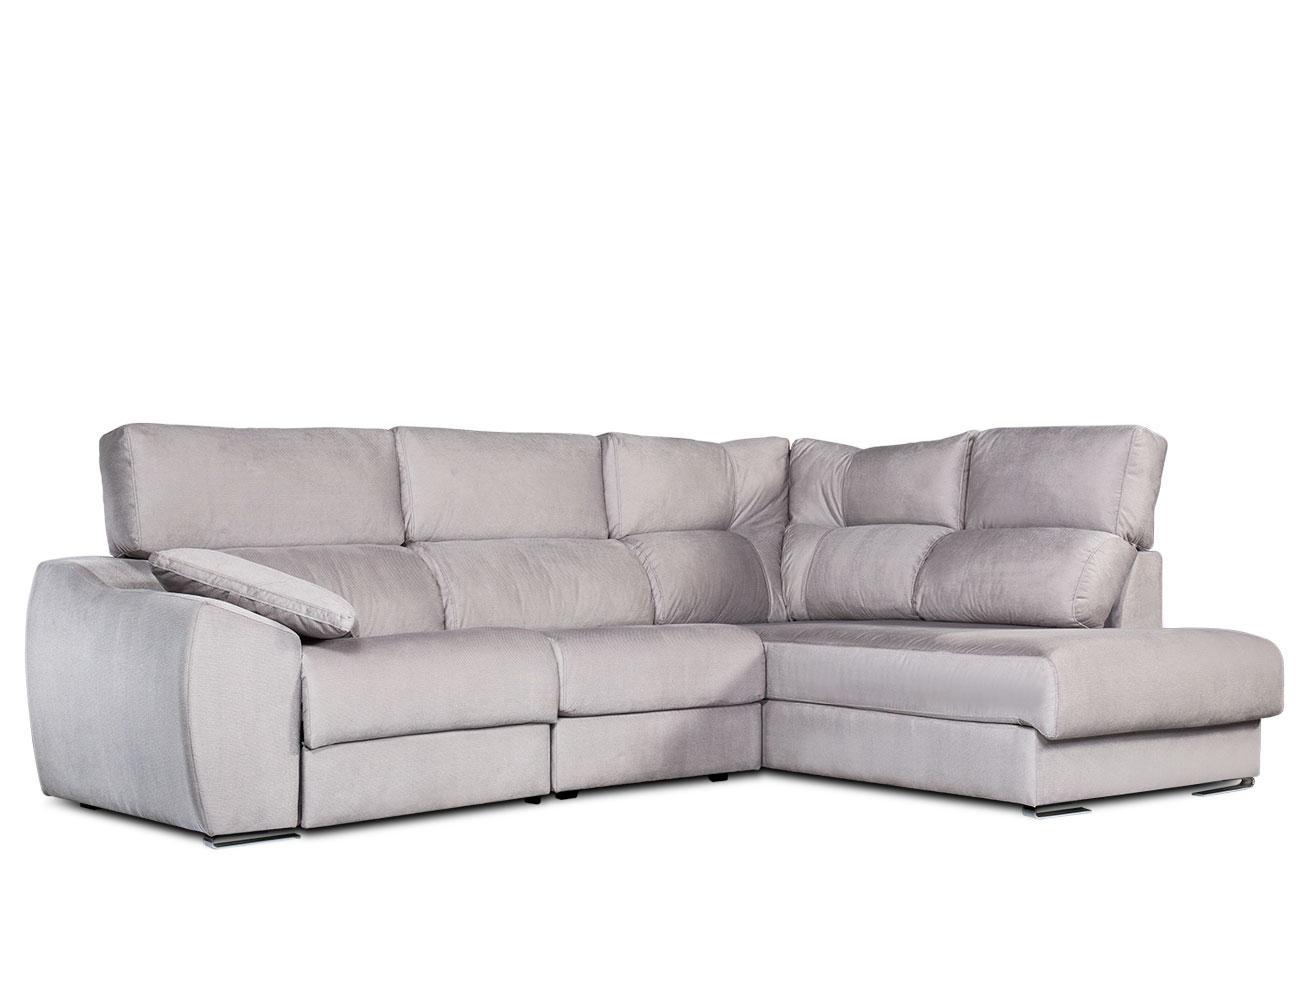 Sofa chaiselongue rincon electrico6